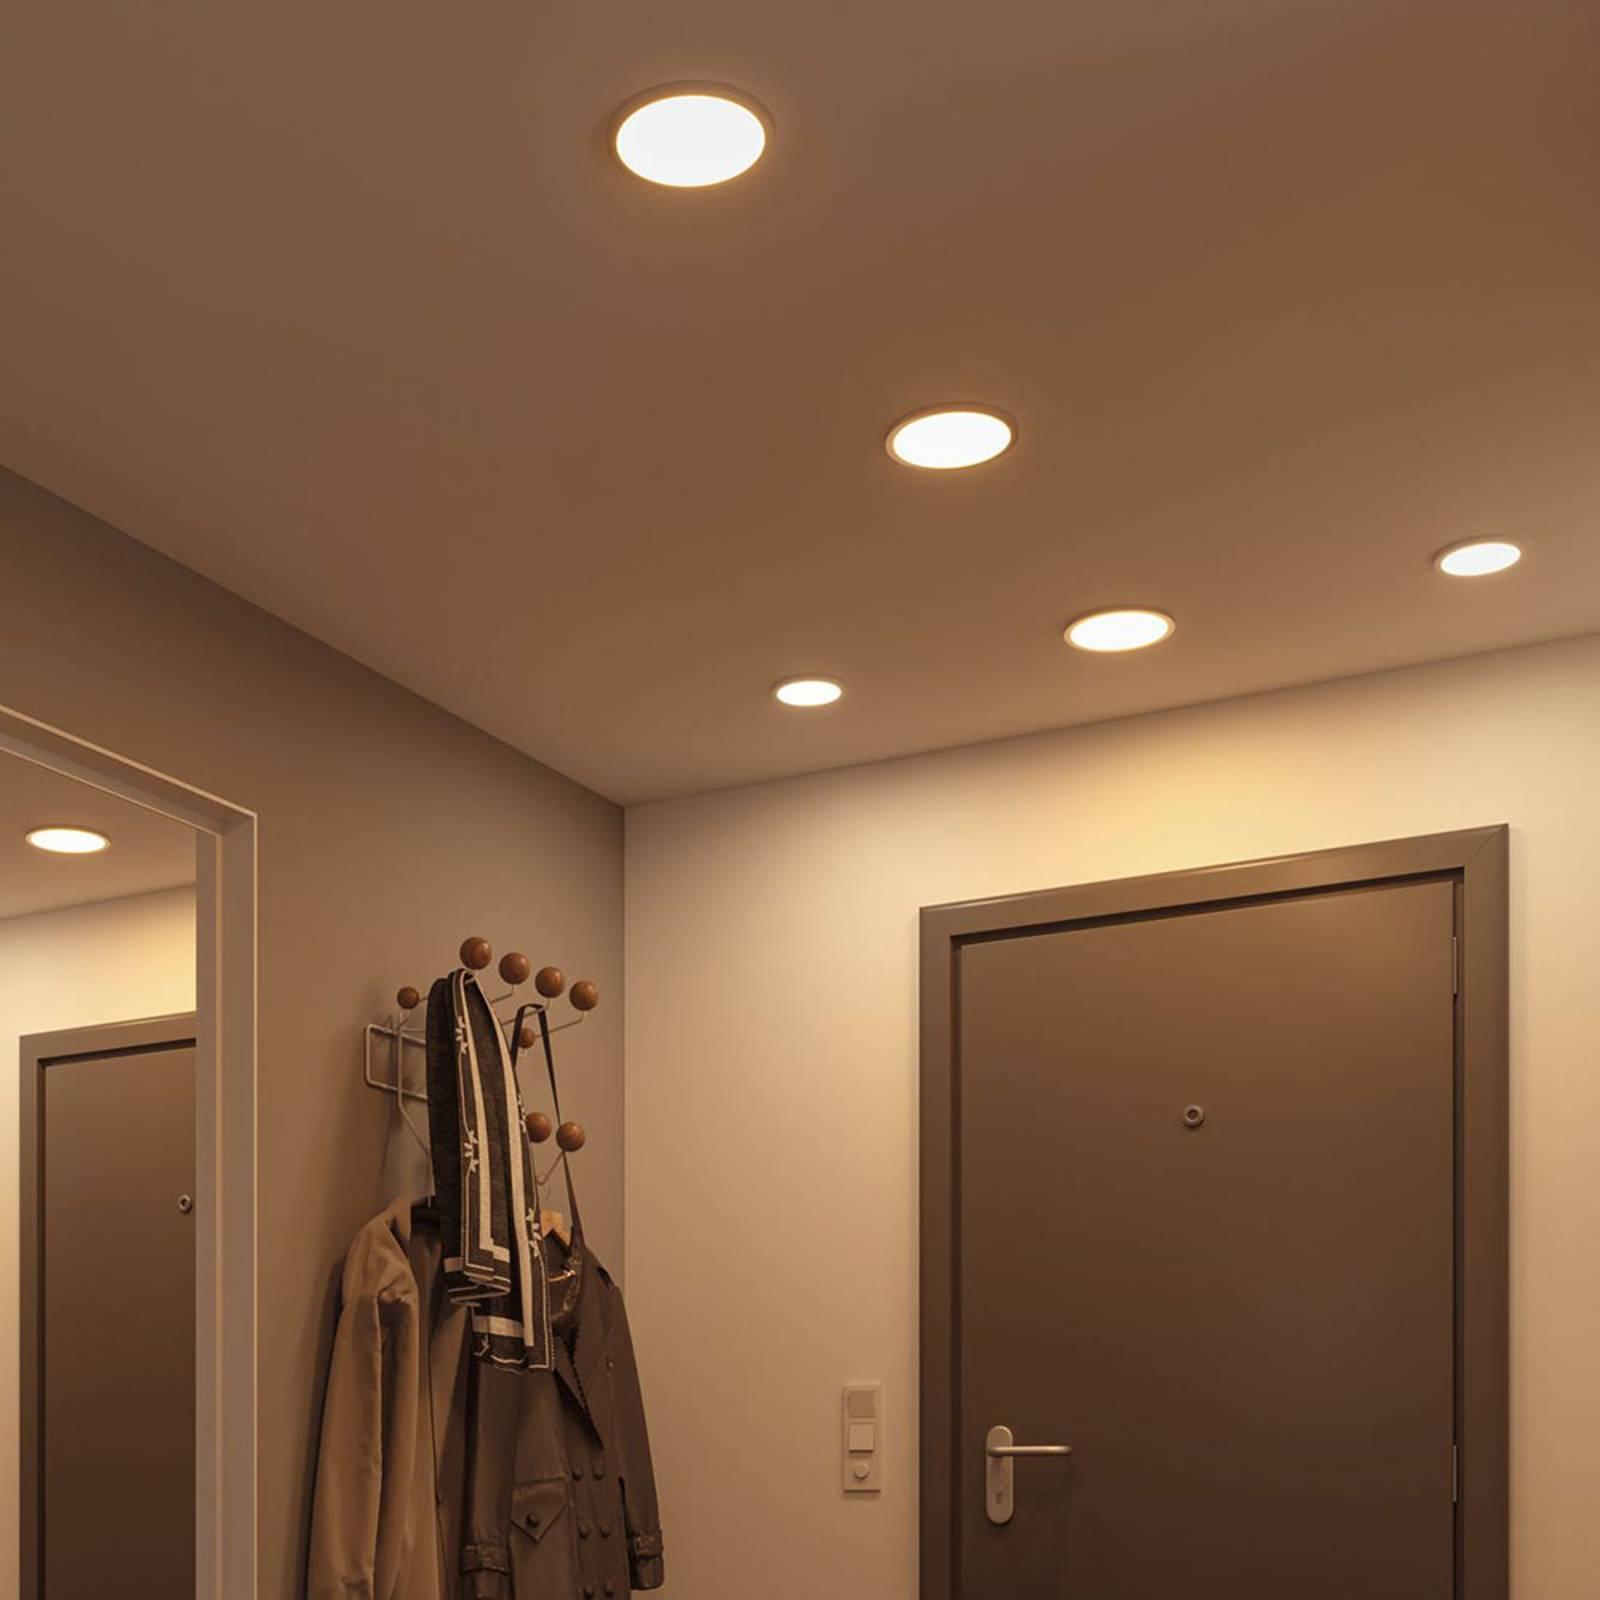 Paulmann-LED-paneeli Areo 4000 K, kromi, 11,8cm